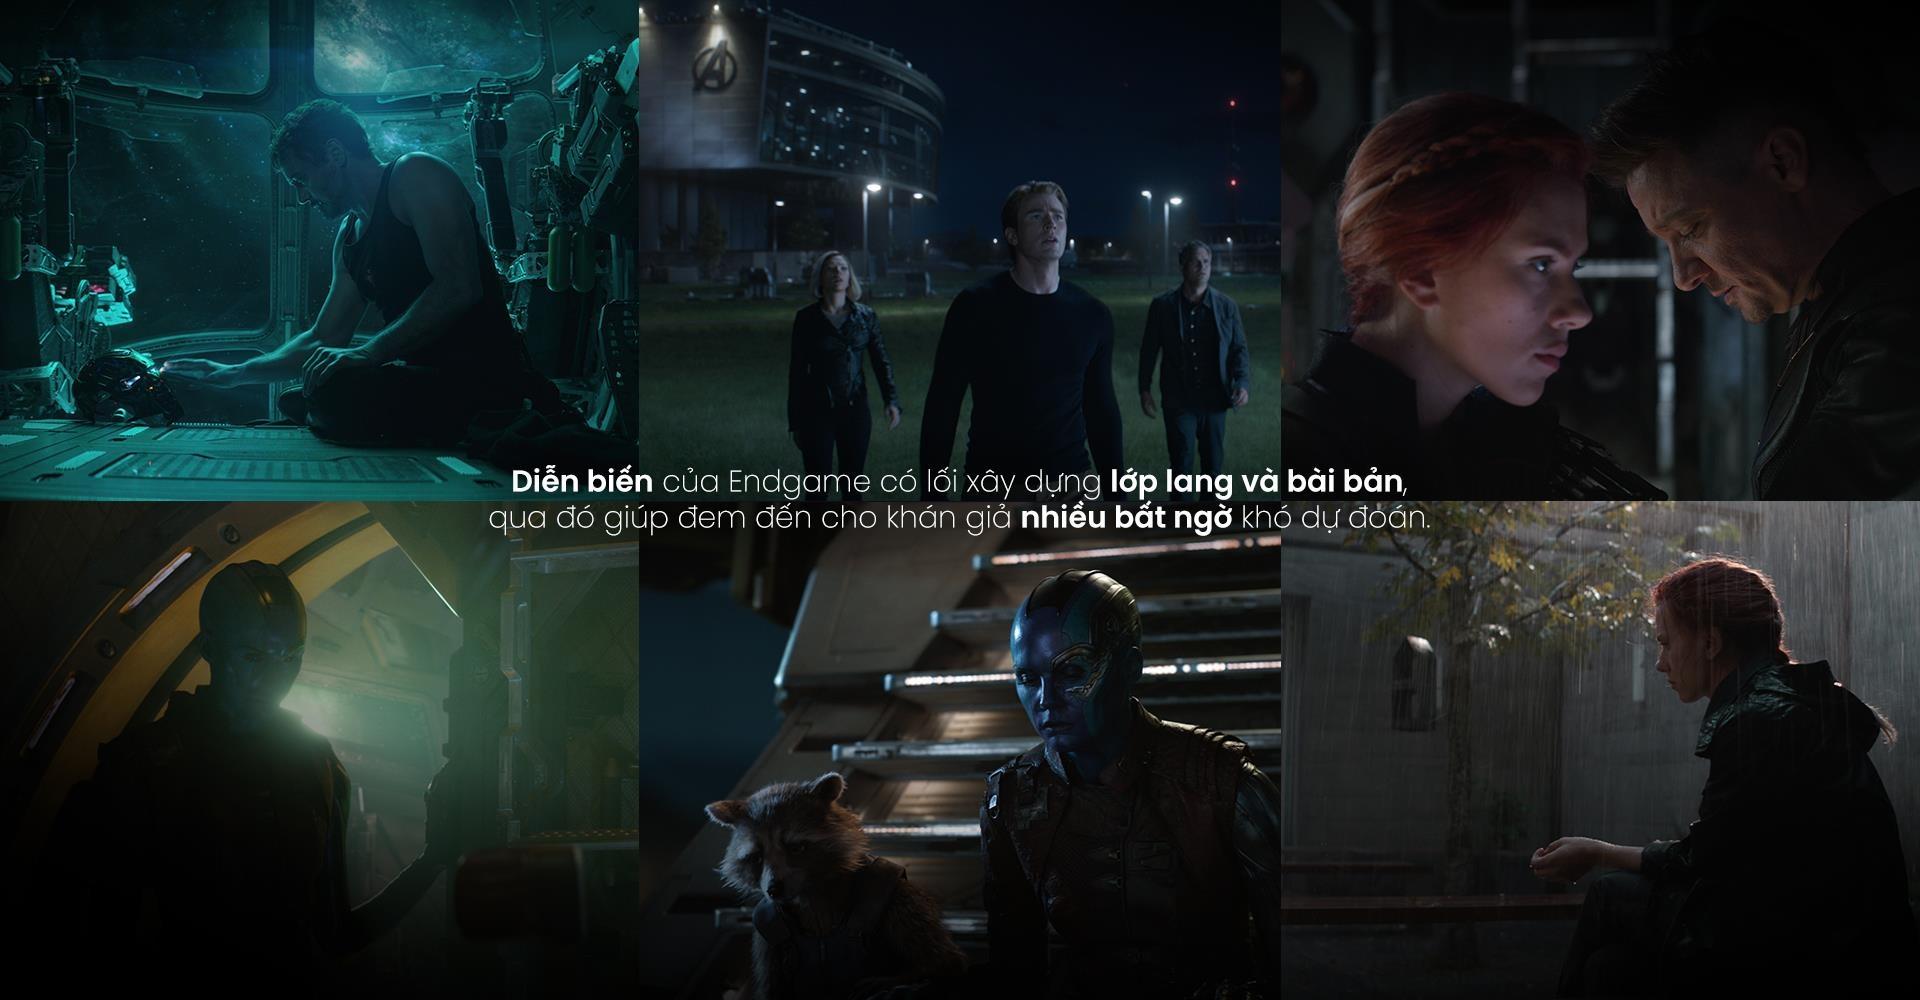 'Avengers: Endgame' - loi tam biet bi trang cua mot ky nguyen anh hung hinh anh 7